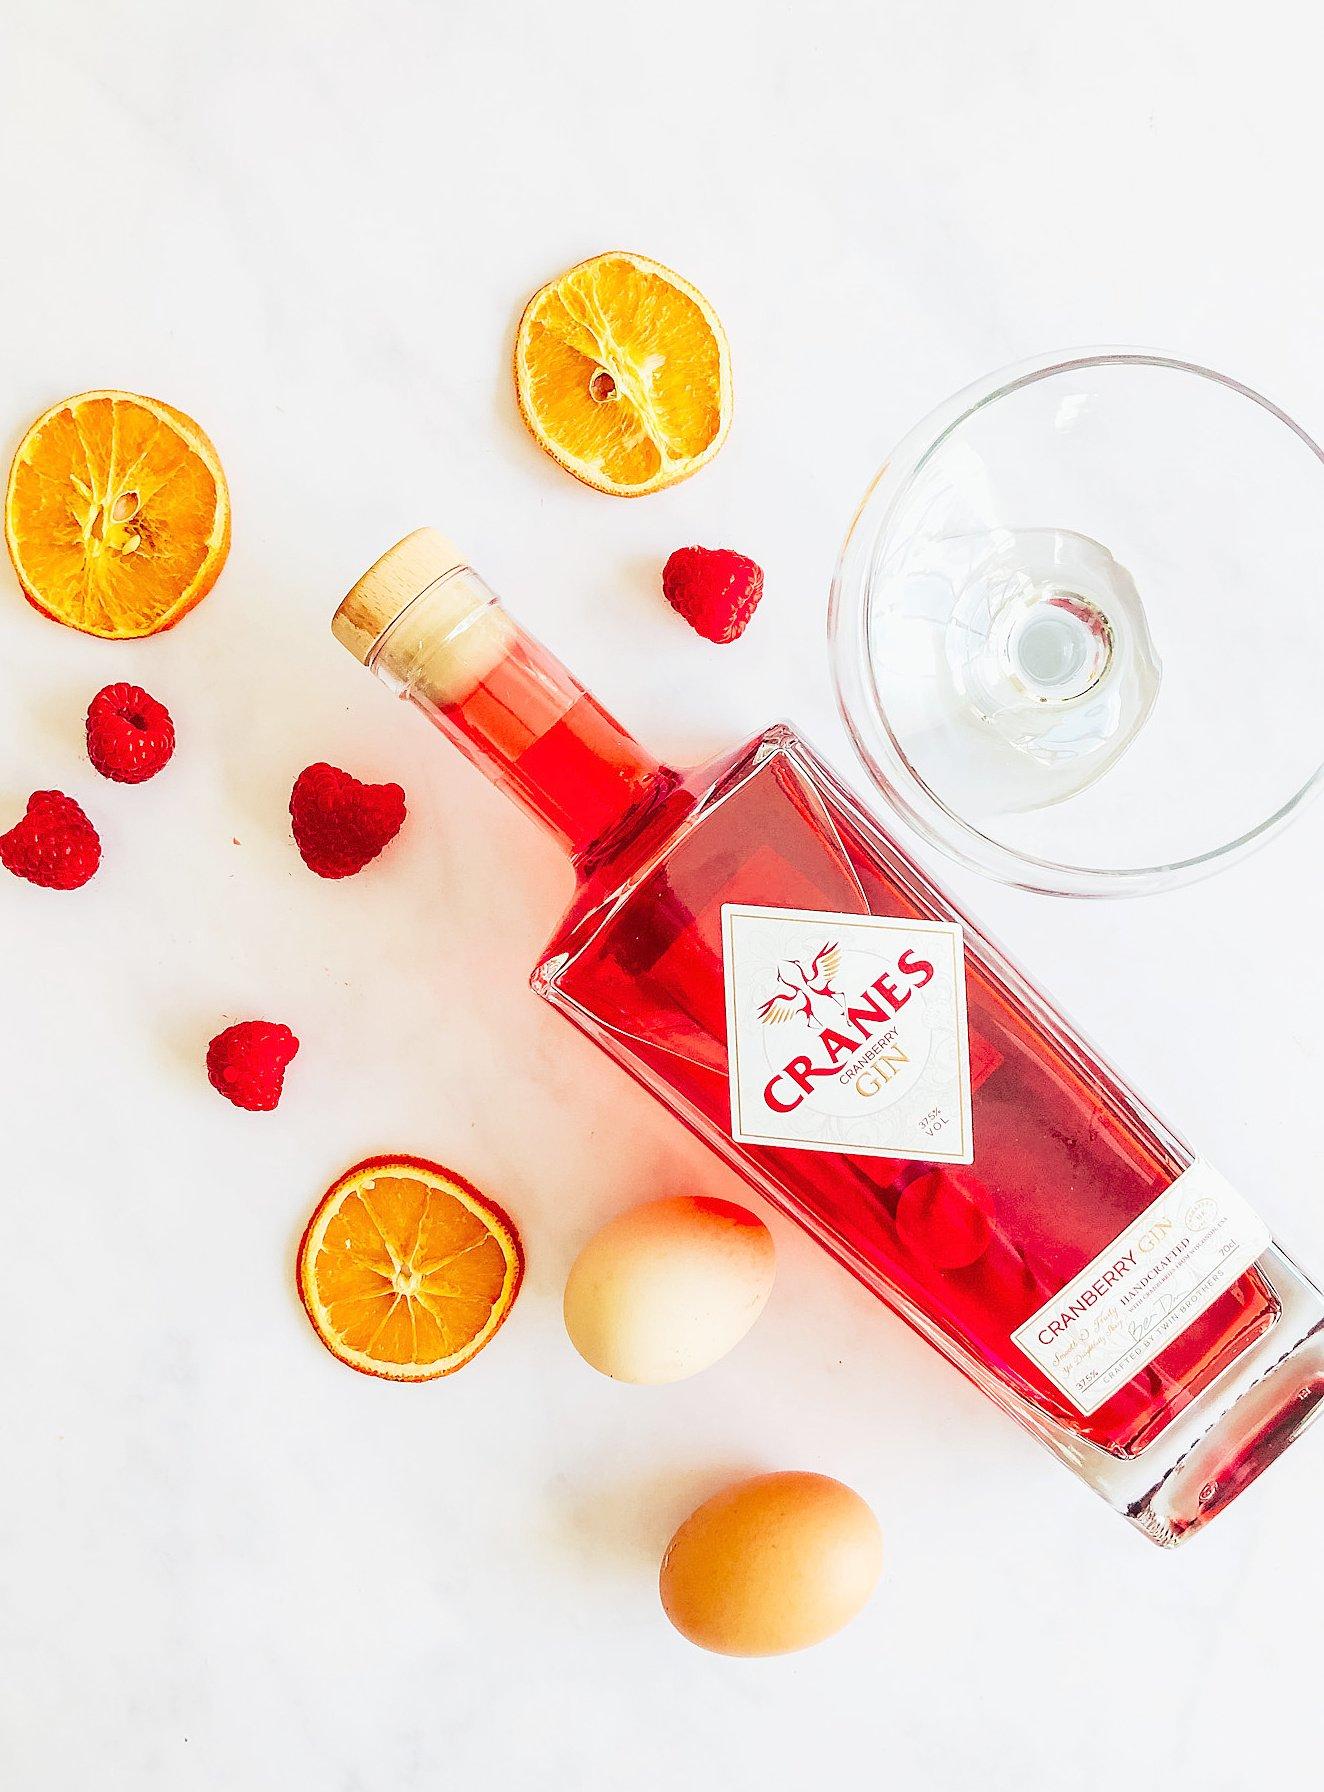 Cranes Cranberry Gin